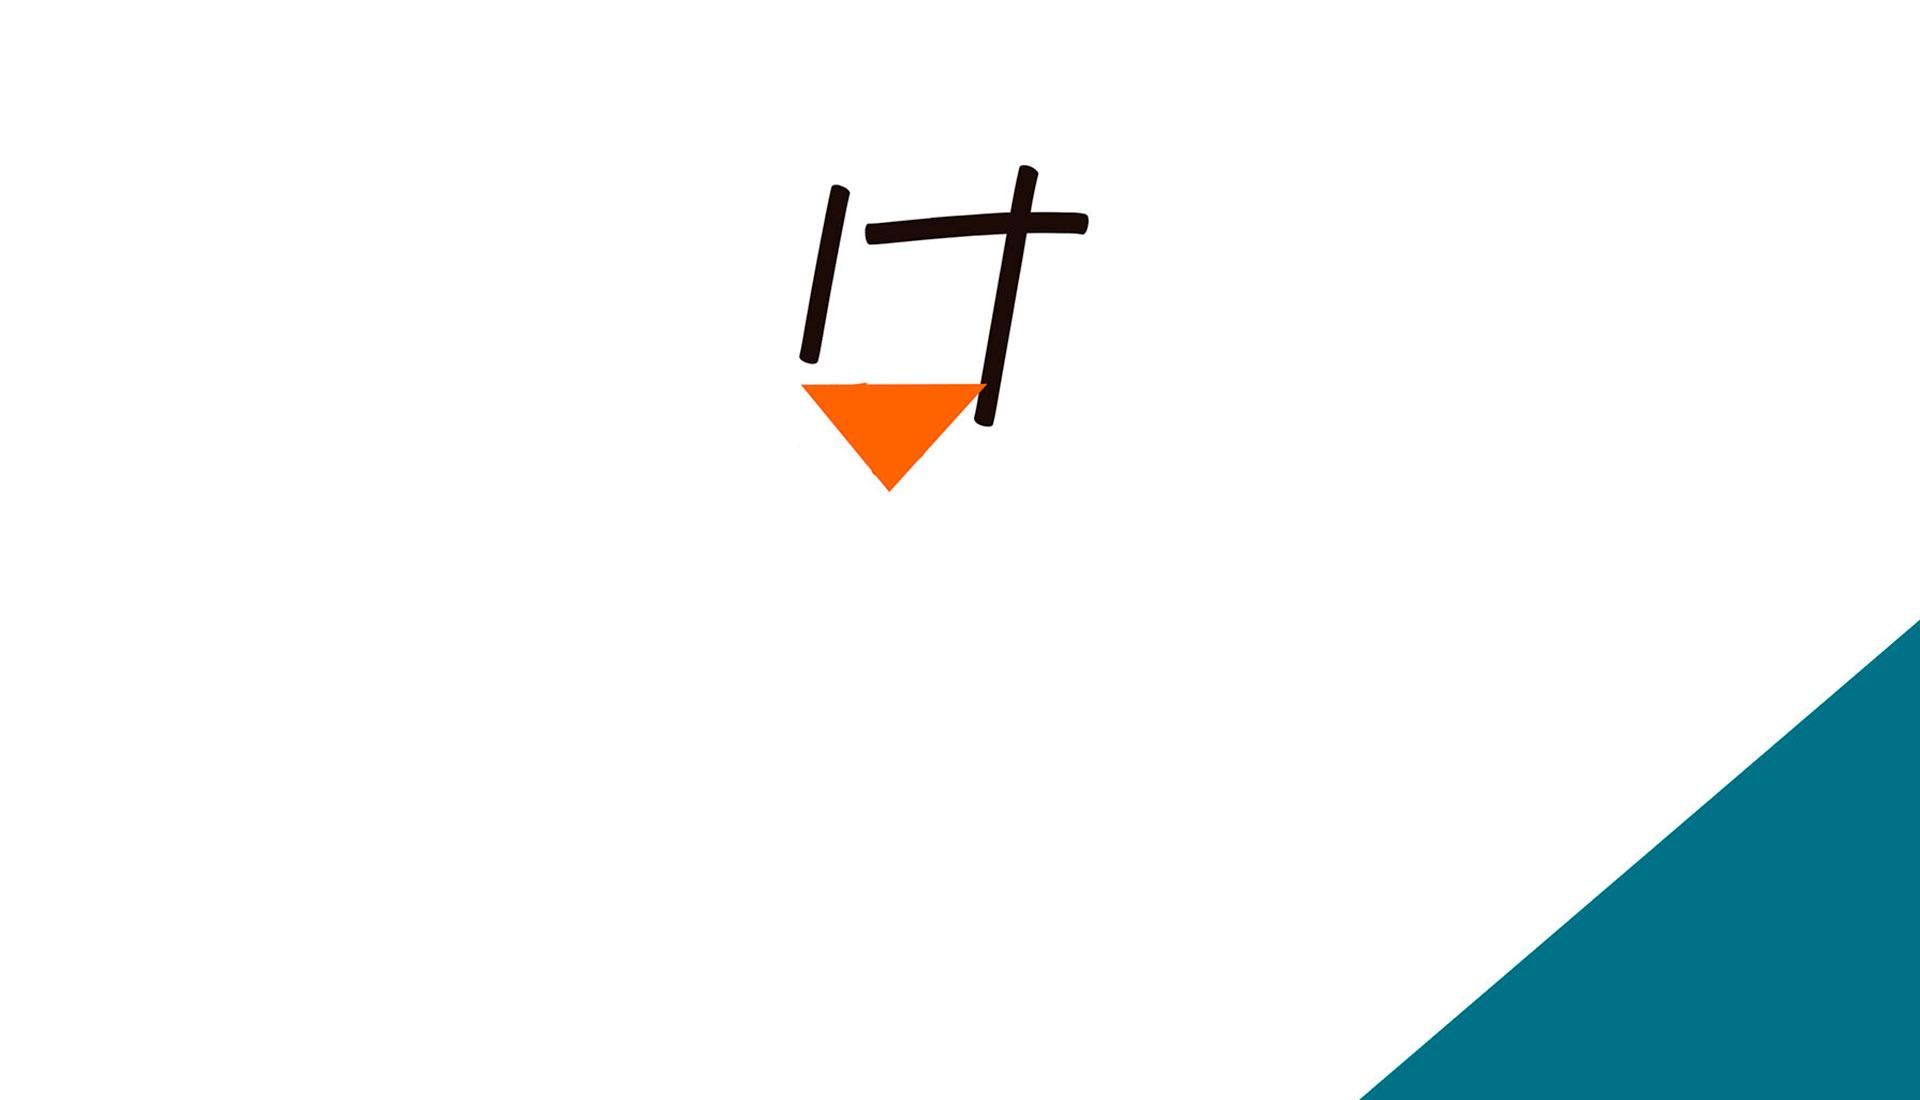 agencia-marketing-digital-pennyworth-identidad-corporativa-restaurante-valencia-11